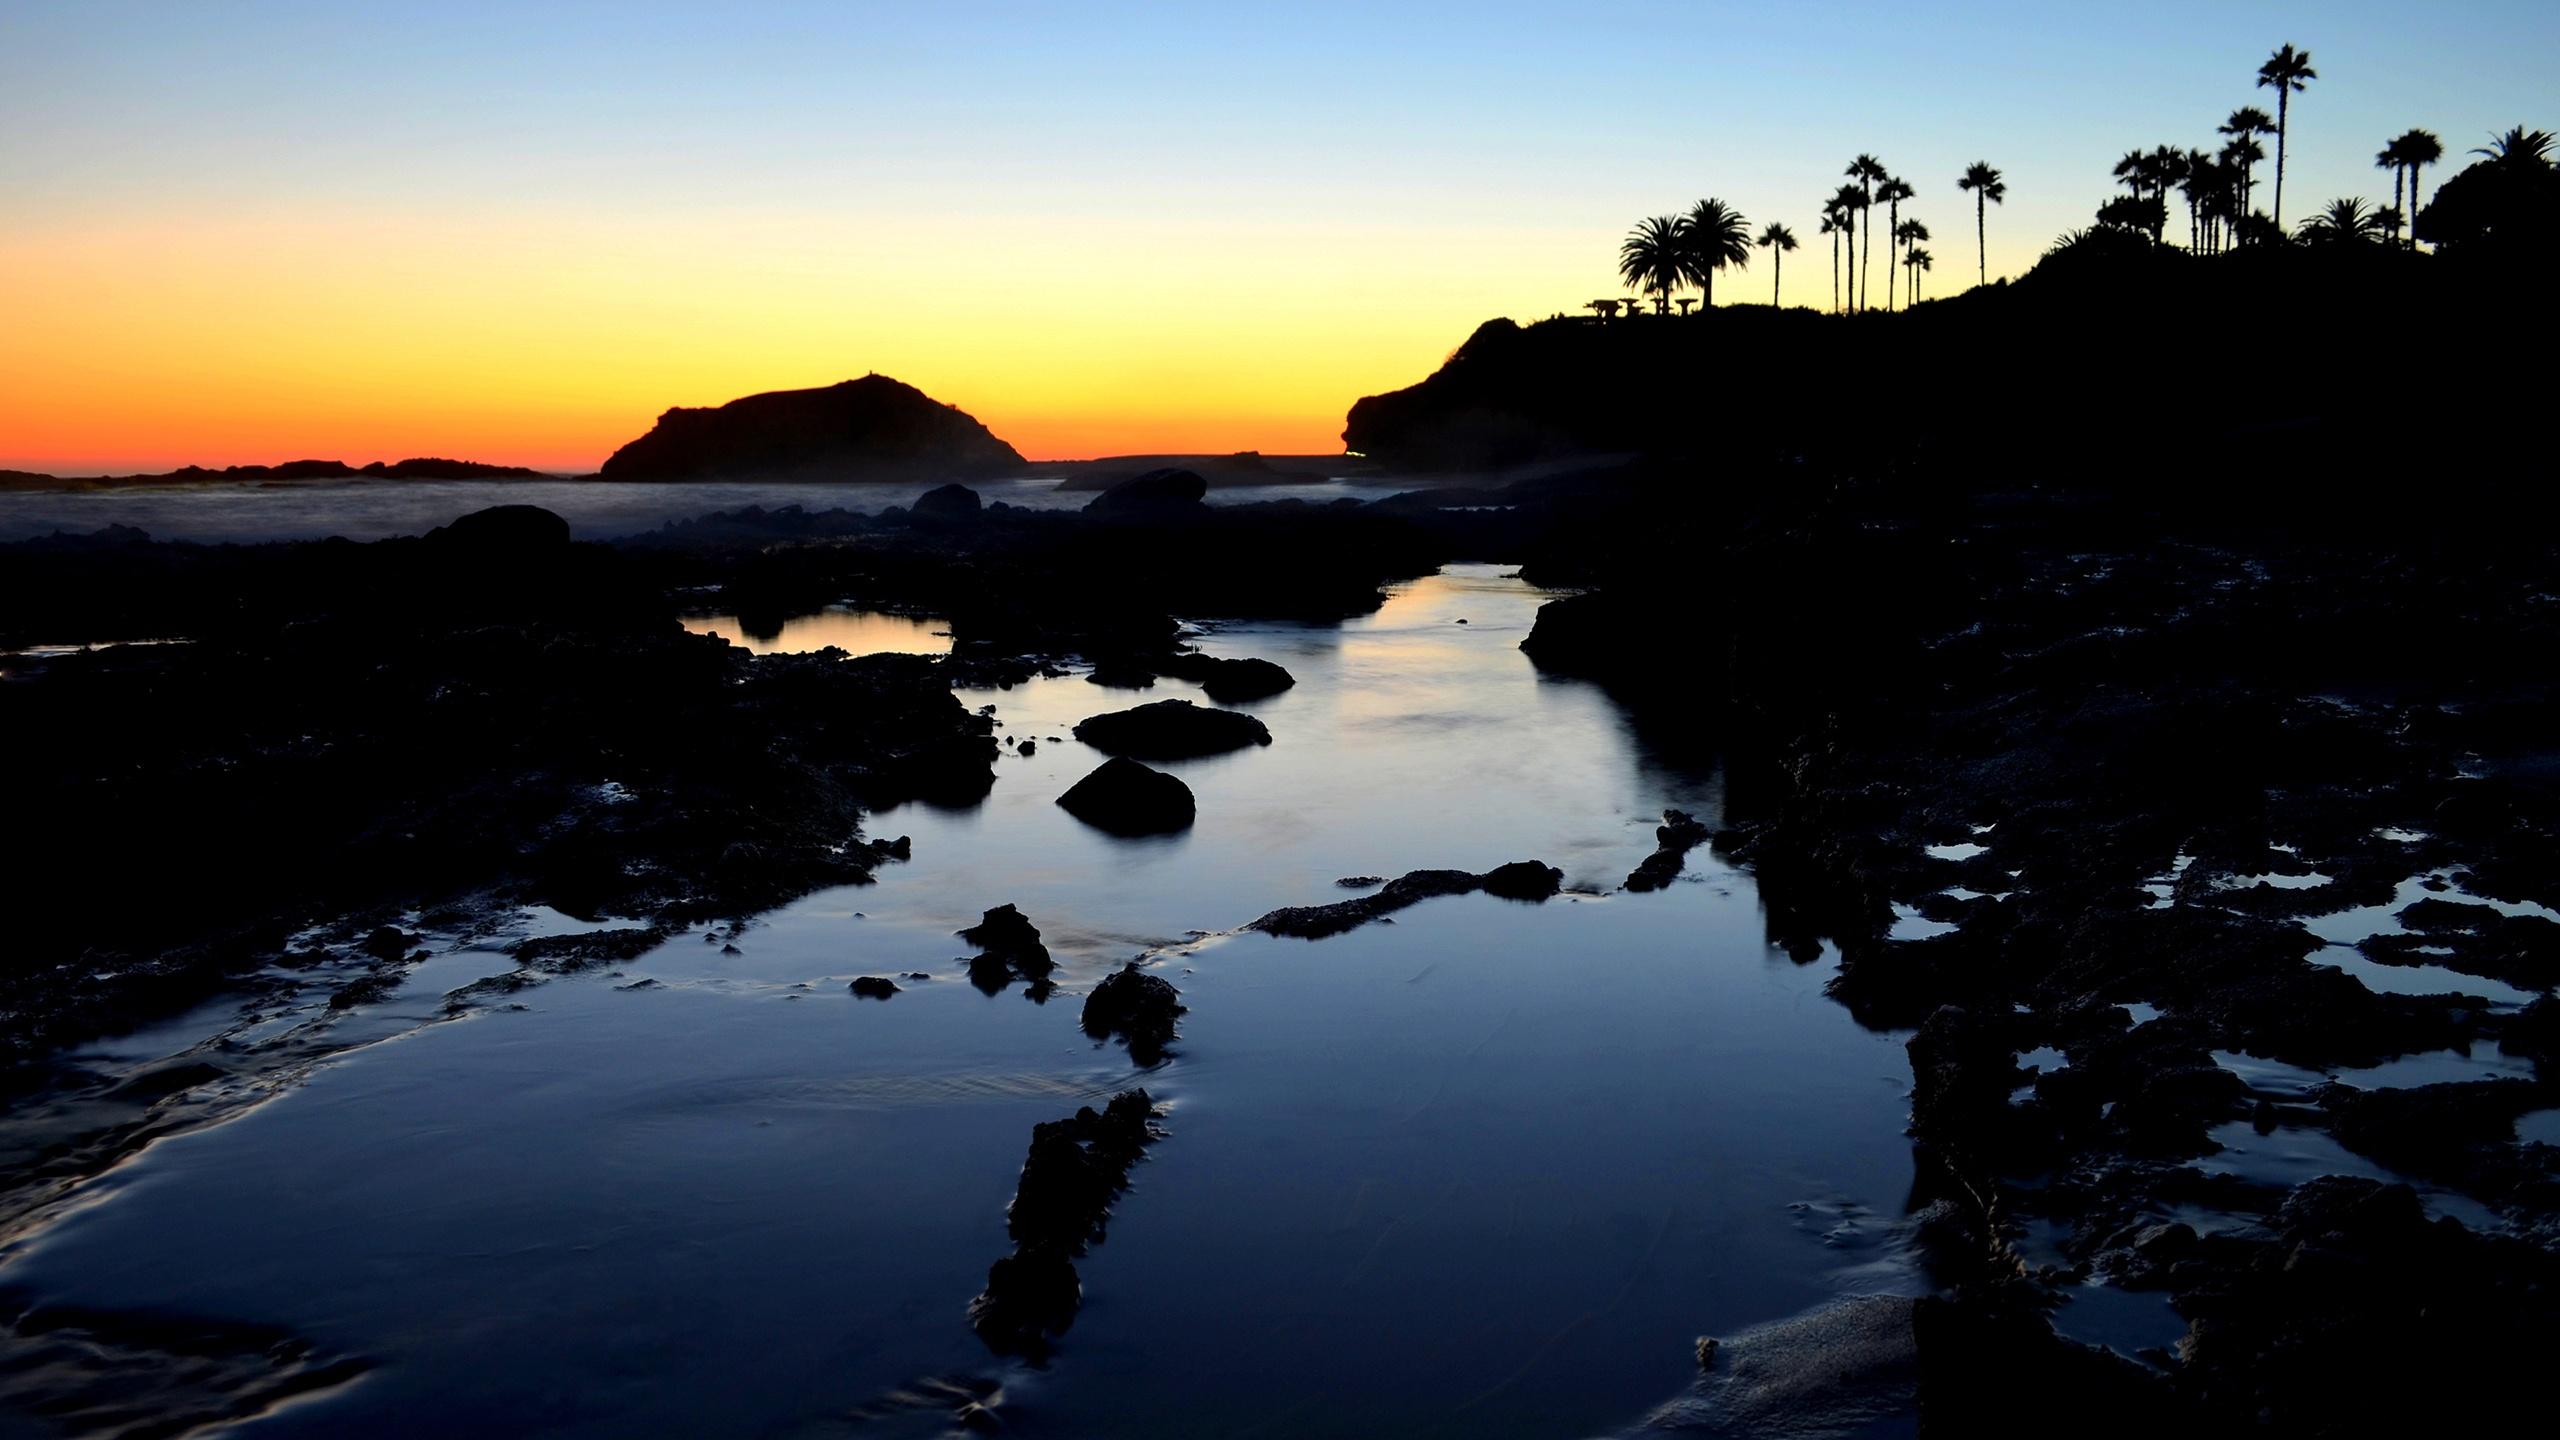 Sunset at Laguna Beach Wallpapers HD Wallpapers 2560x1440